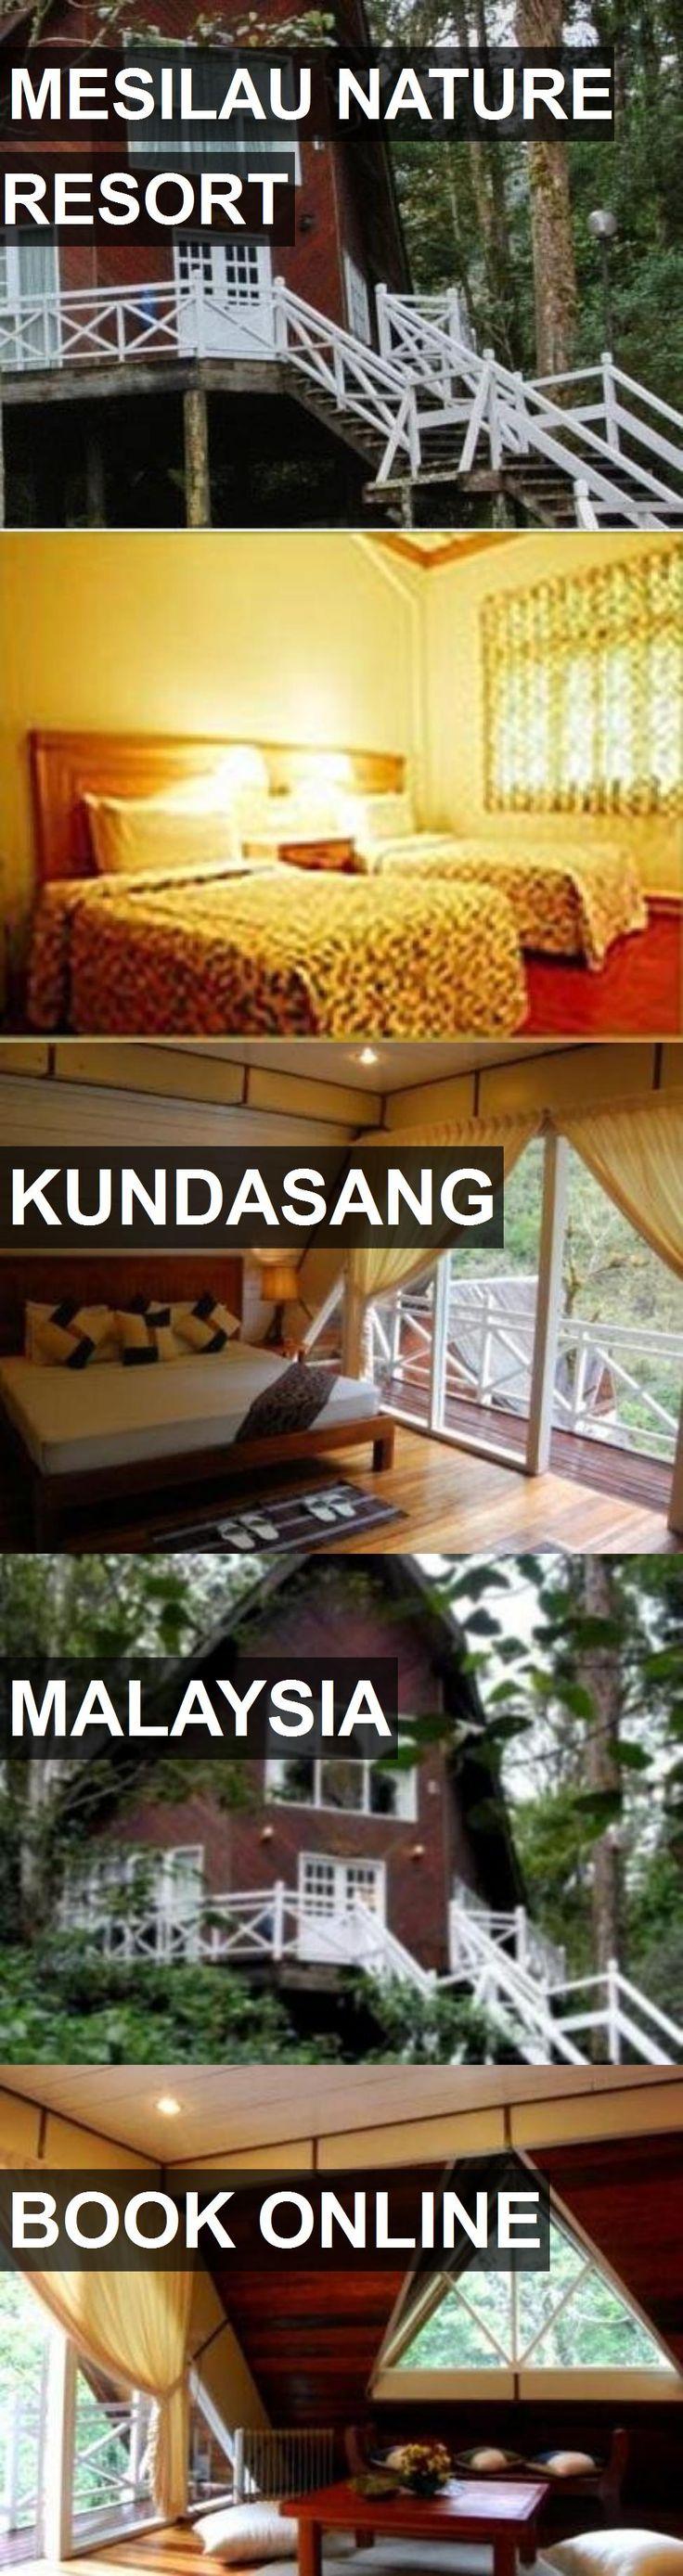 The 25 best Malaysia resorts ideas on Pinterest